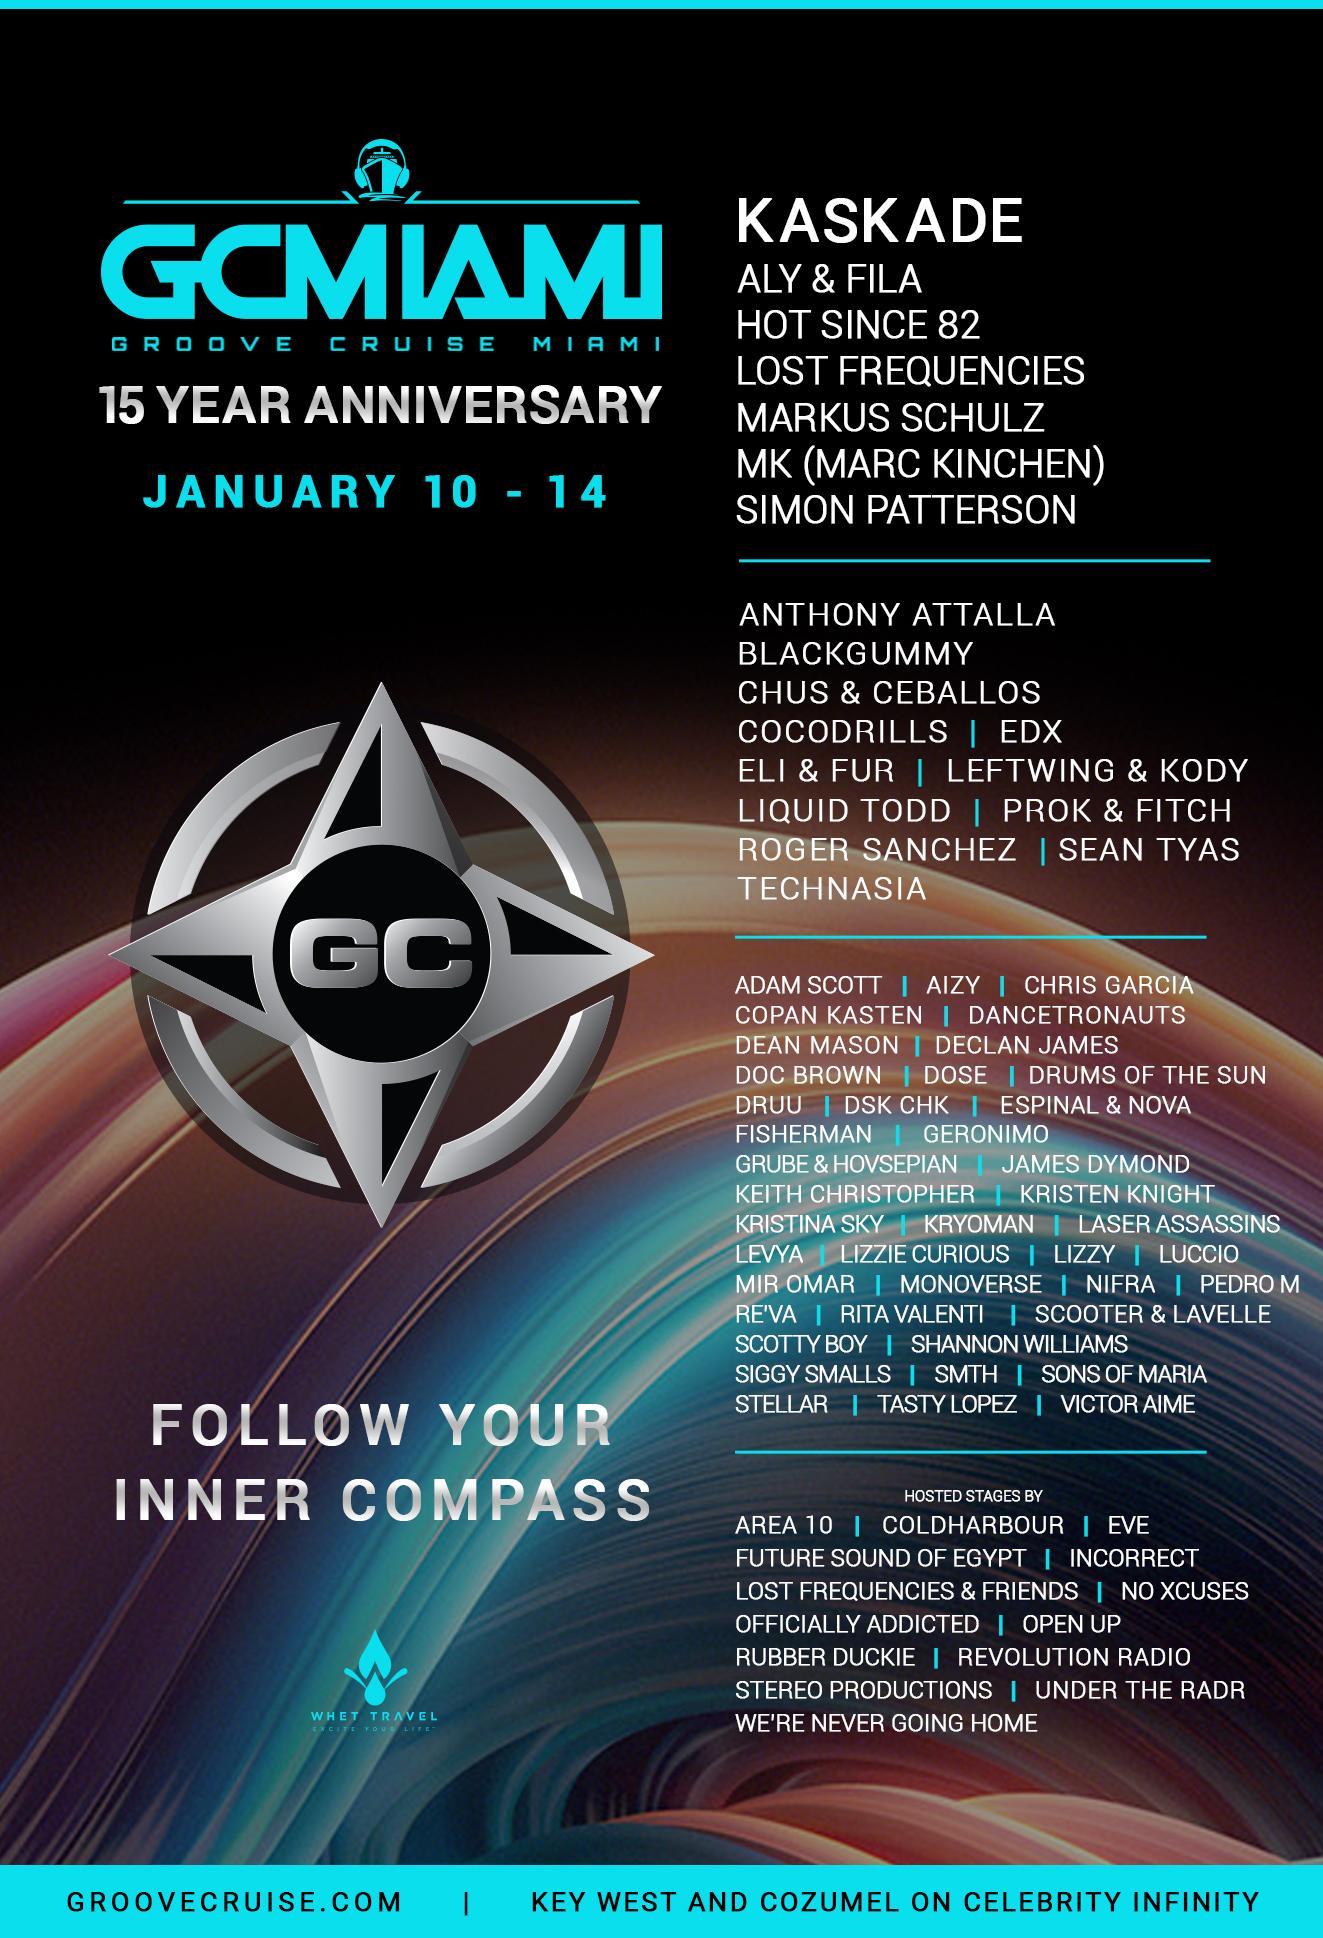 Groove Cruise Miami 2019 Lineup